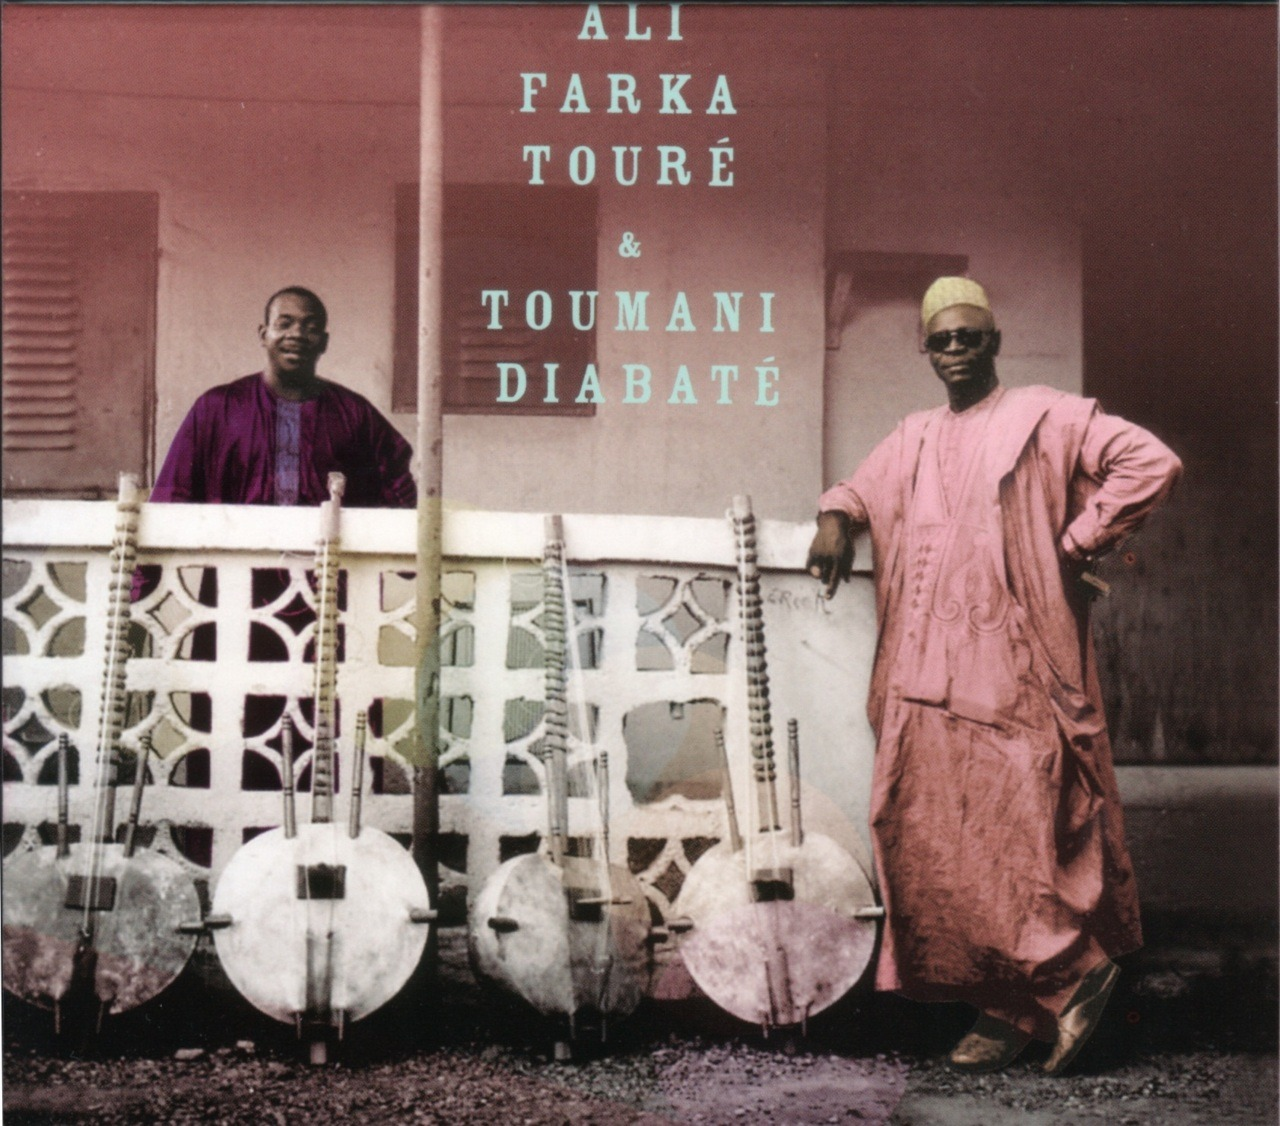 nigeriancoverproject:  Ali Farka Touré and Toumani Diabaté - Ali & Toumani